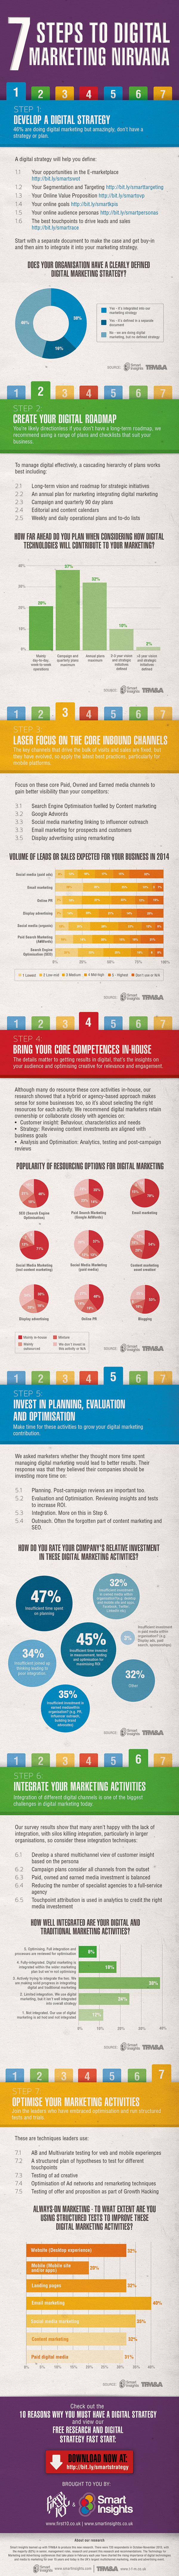 Managing-Digital-Marketing-7-steps-Infographic